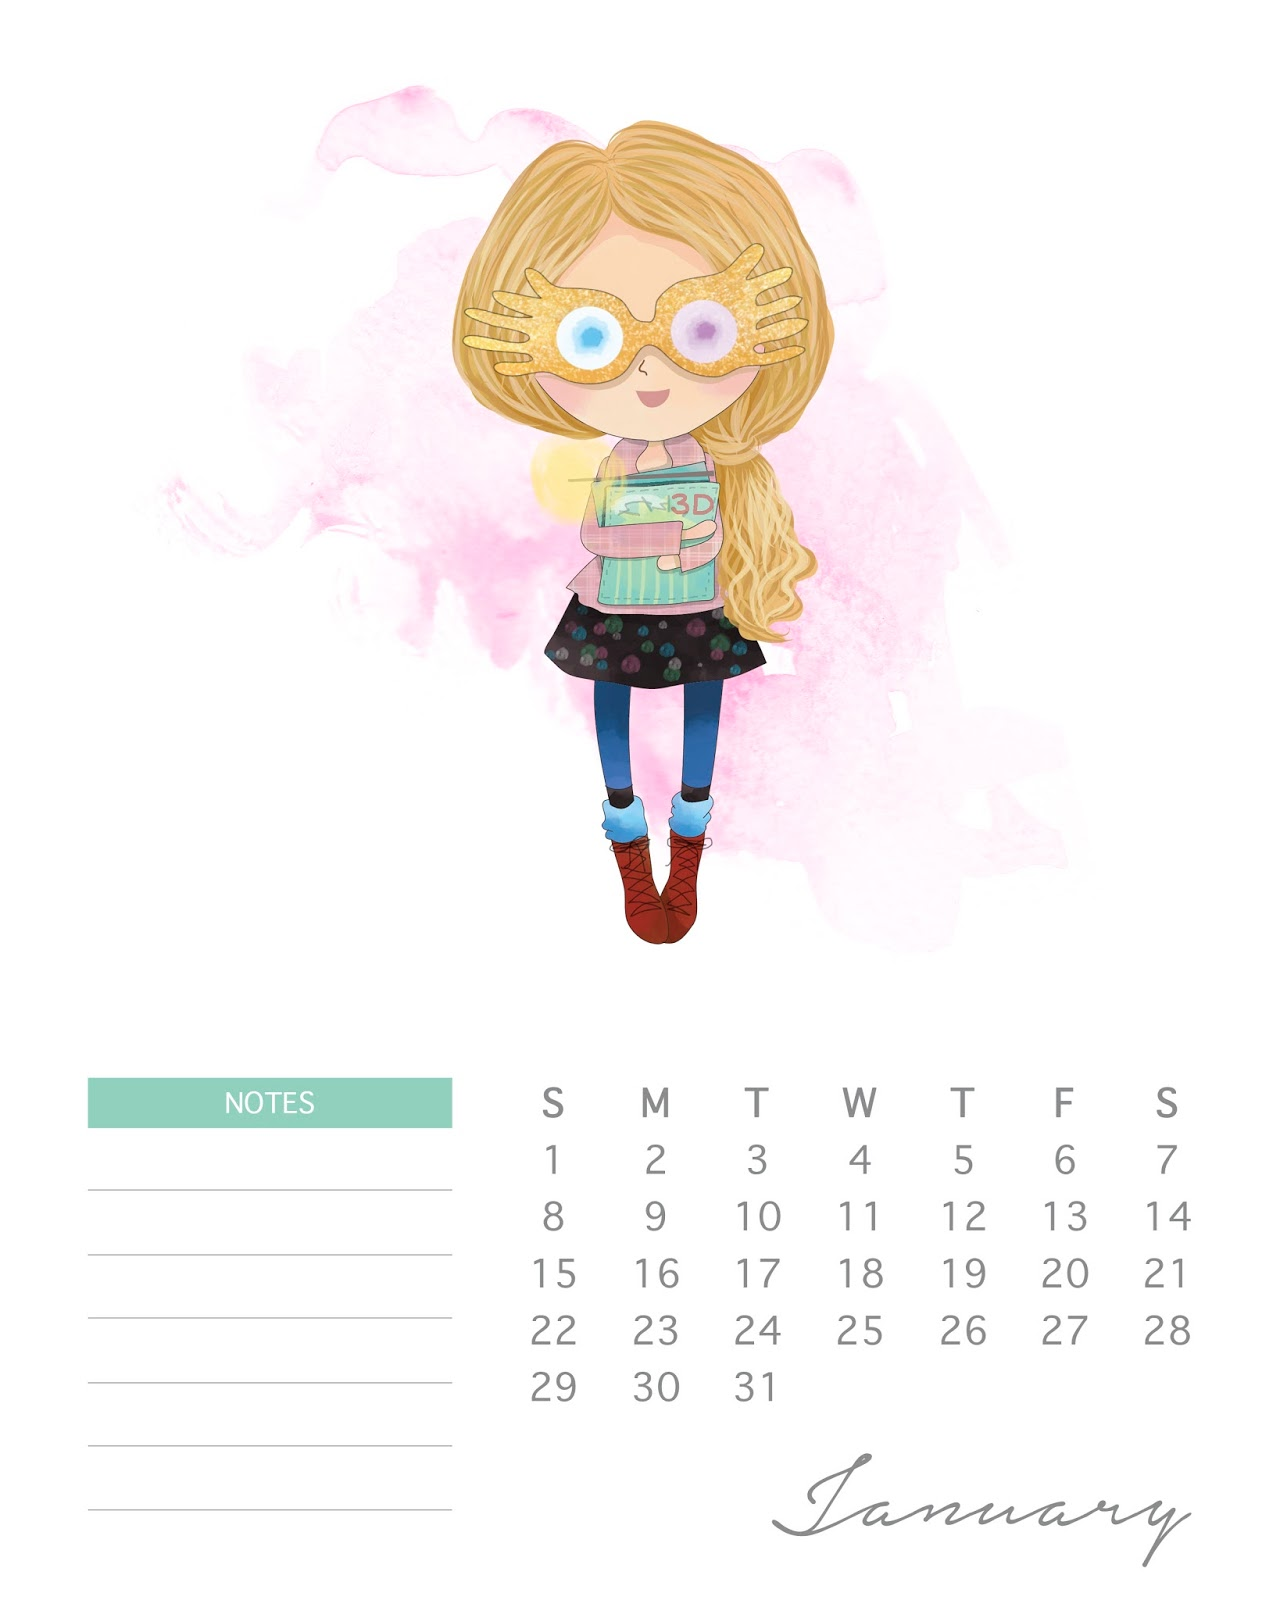 Calendario 2017 De Harry Potter Para Imprimir Gratis Oh My